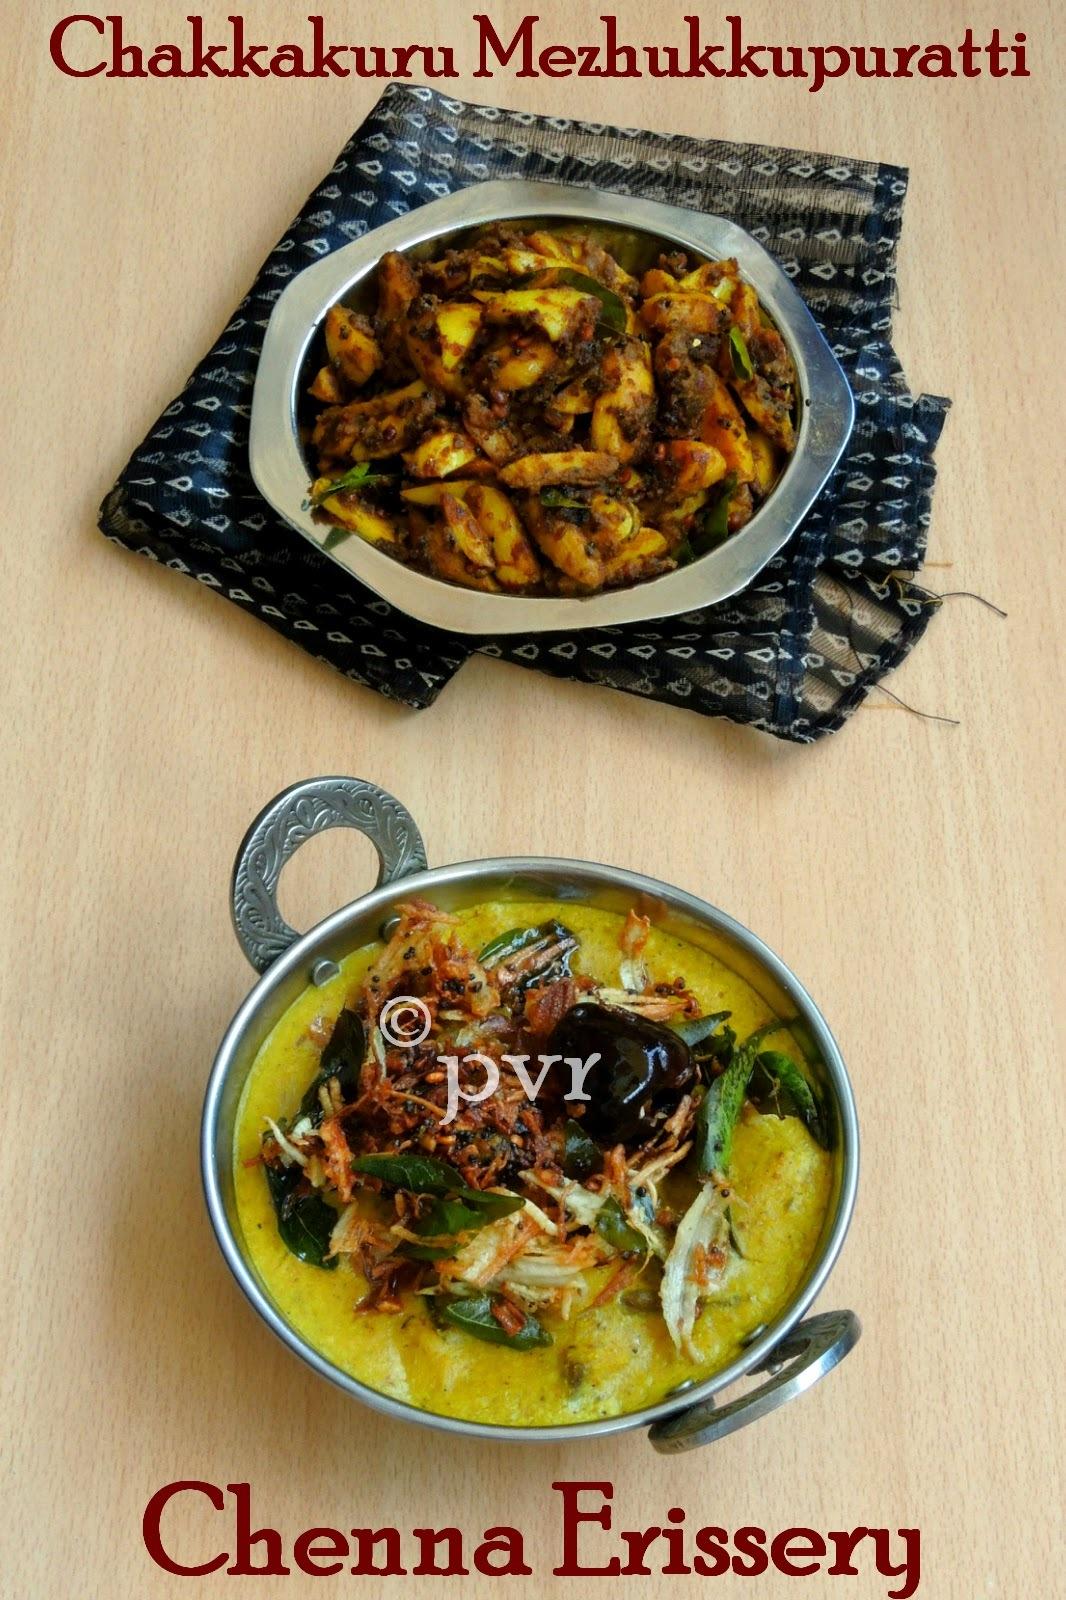 Chenna Erissery & Chakkakuru Mezhukkupuratti - Kerala Special